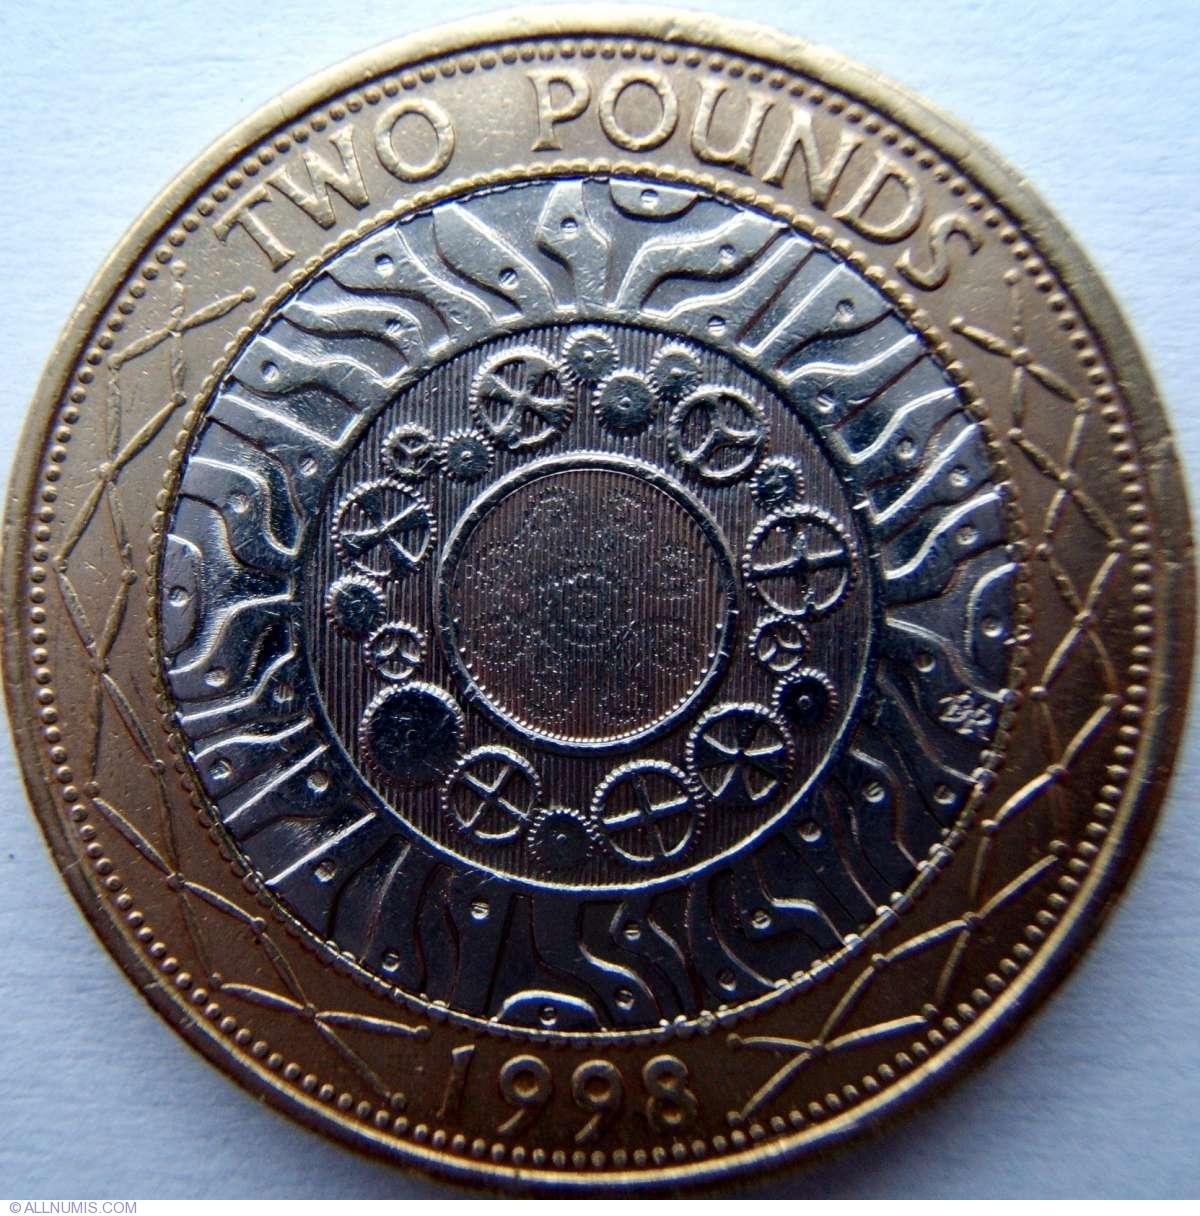 2 Pounds 1998 Elizabeth Ii 1952 Present Great Britain